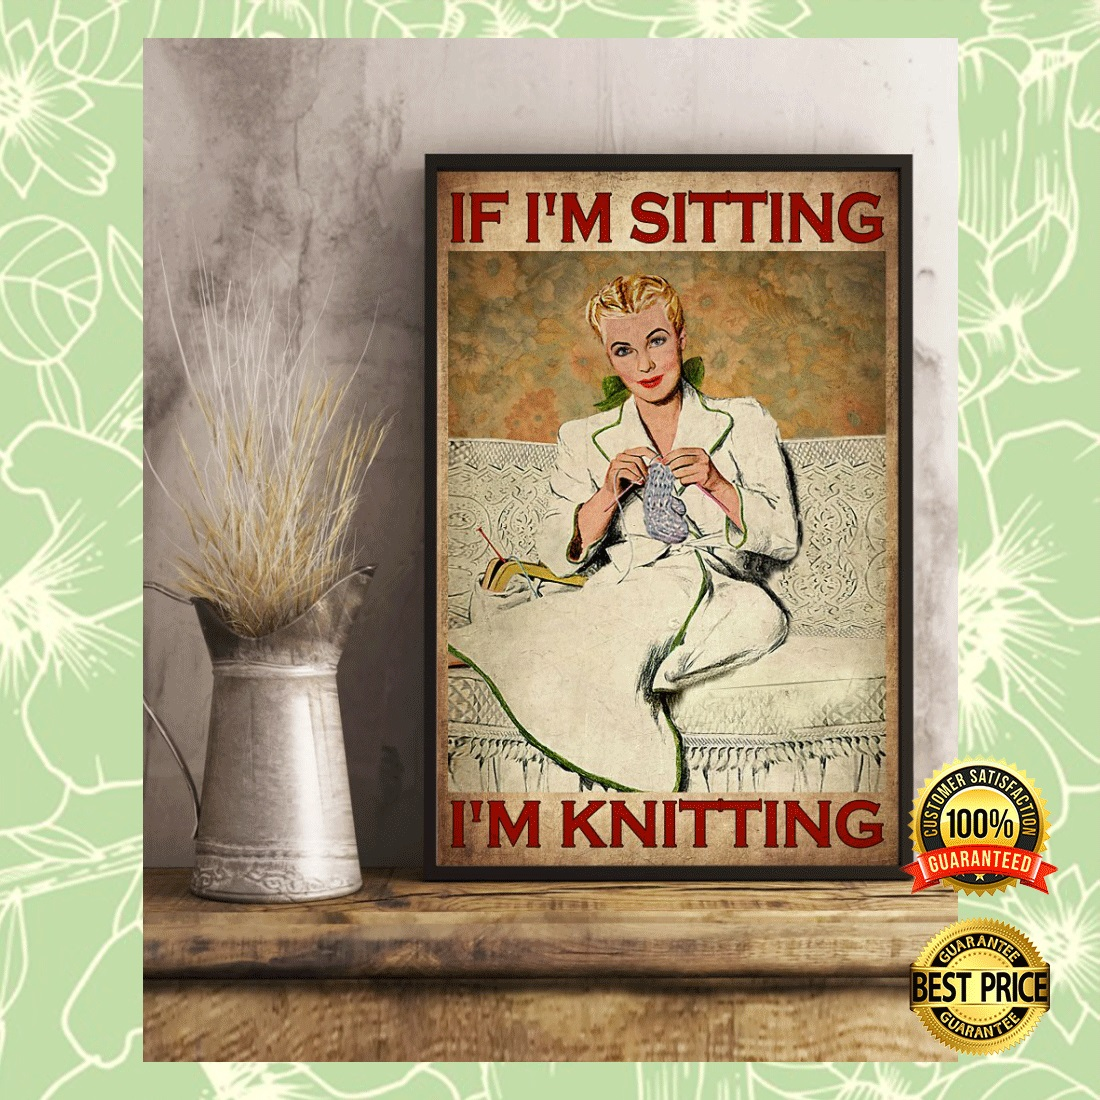 IF I'M SITTING I'M KNITTING POSTER 7